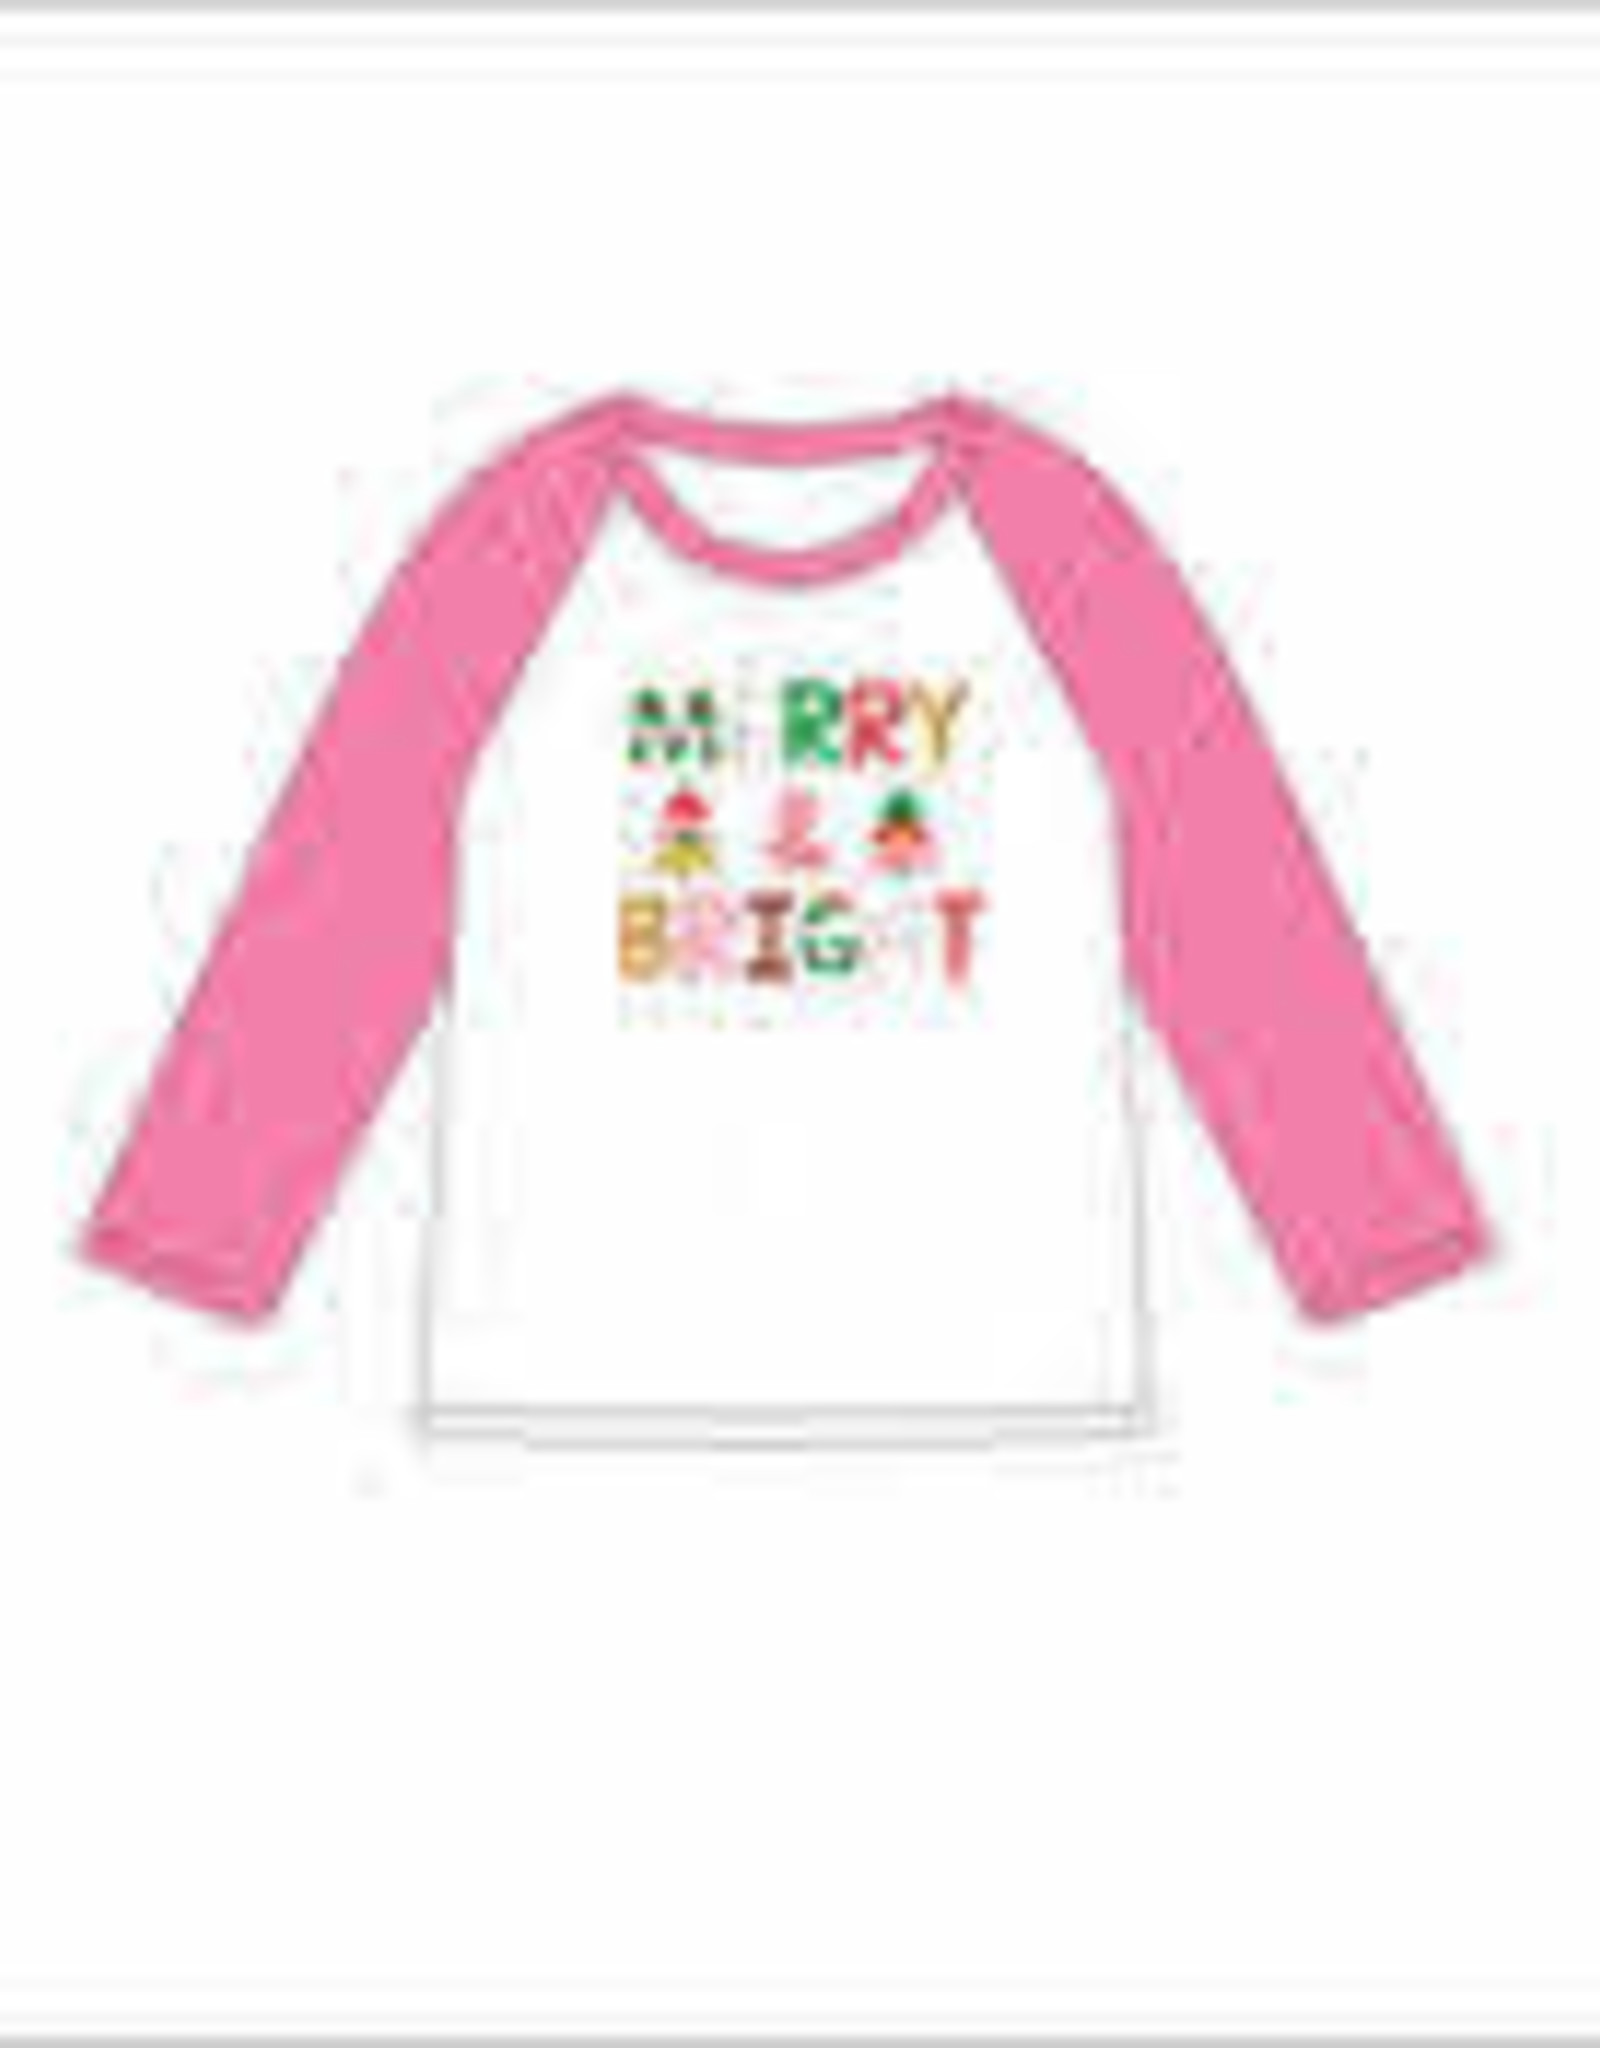 Jane Marie Jane Marie KIDS 3/4 Sleeve Tshirt- Merry & Bright